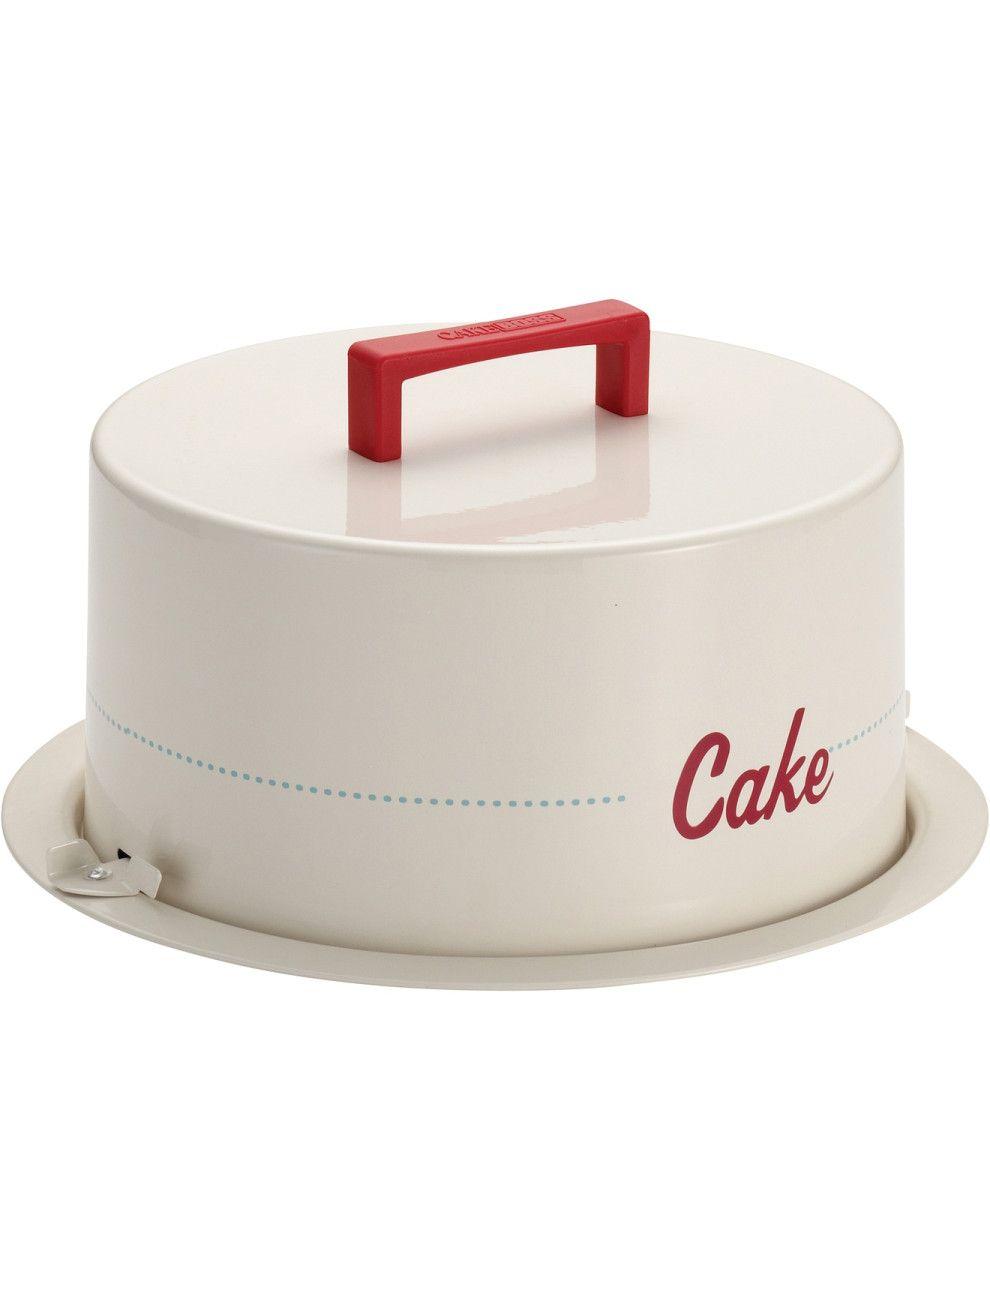 Metal Cake Carrier Cake | David Jones